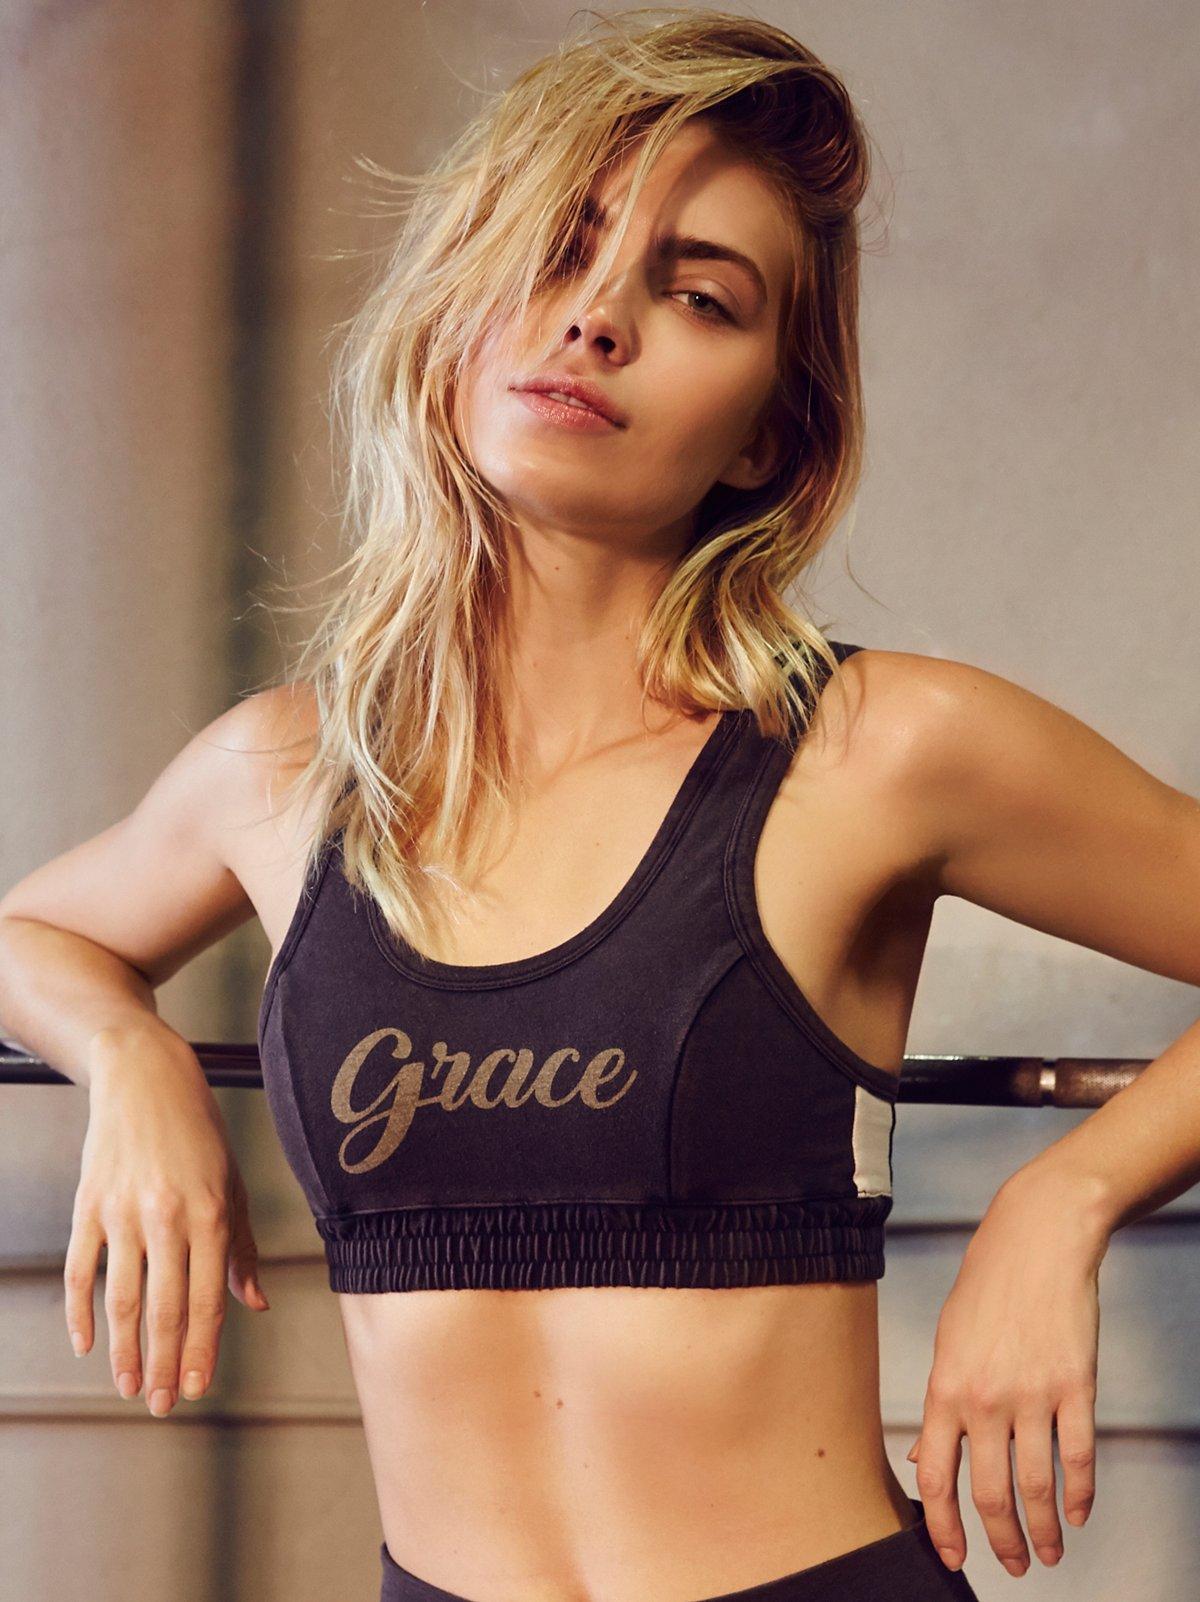 Grace Sports Bra